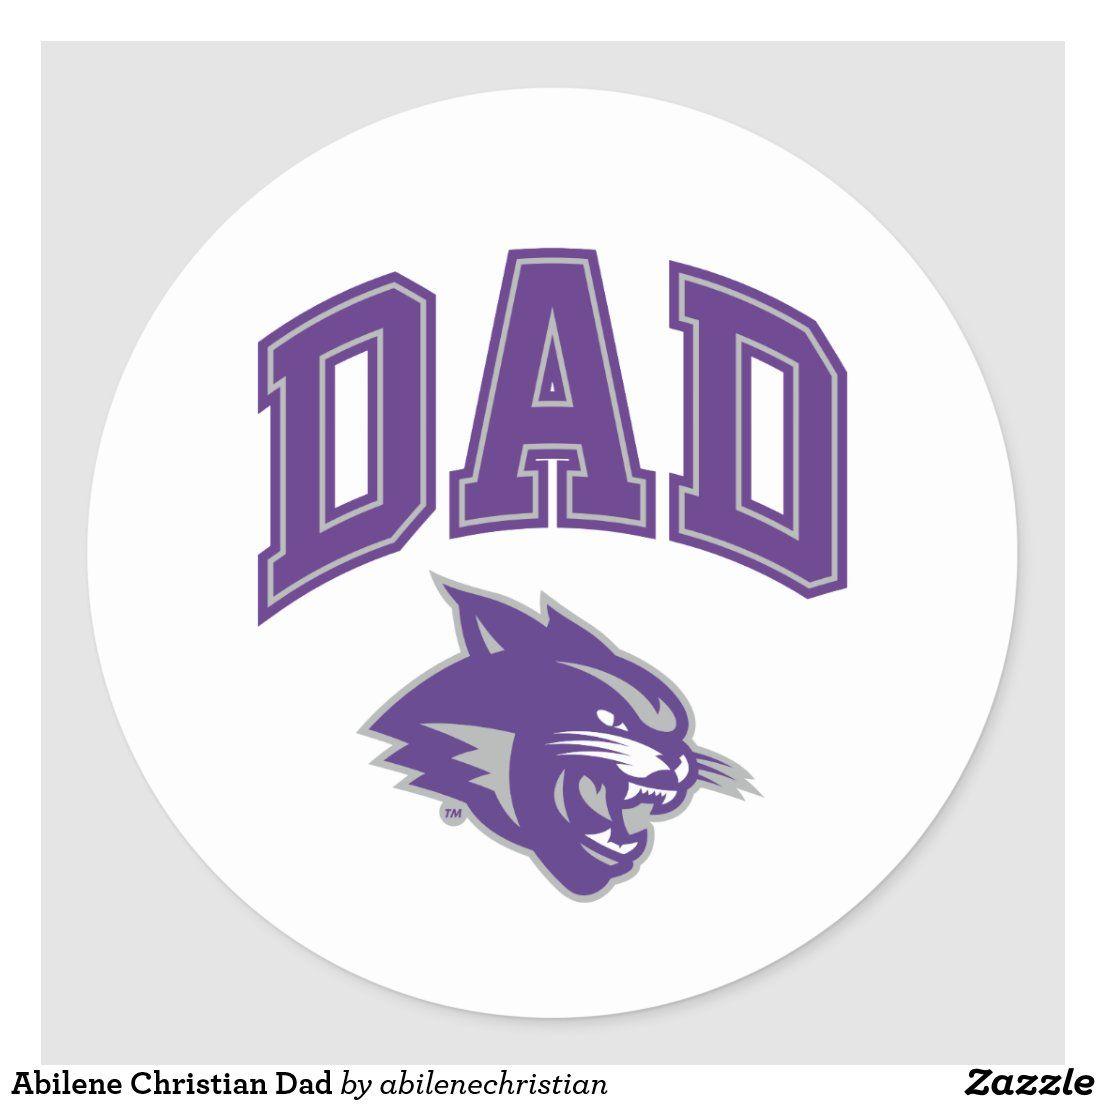 Abilene Christian Dad Classic Round Sticker Zazzle Com In 2020 Christian Dad Abilene Christian Dad Crafts